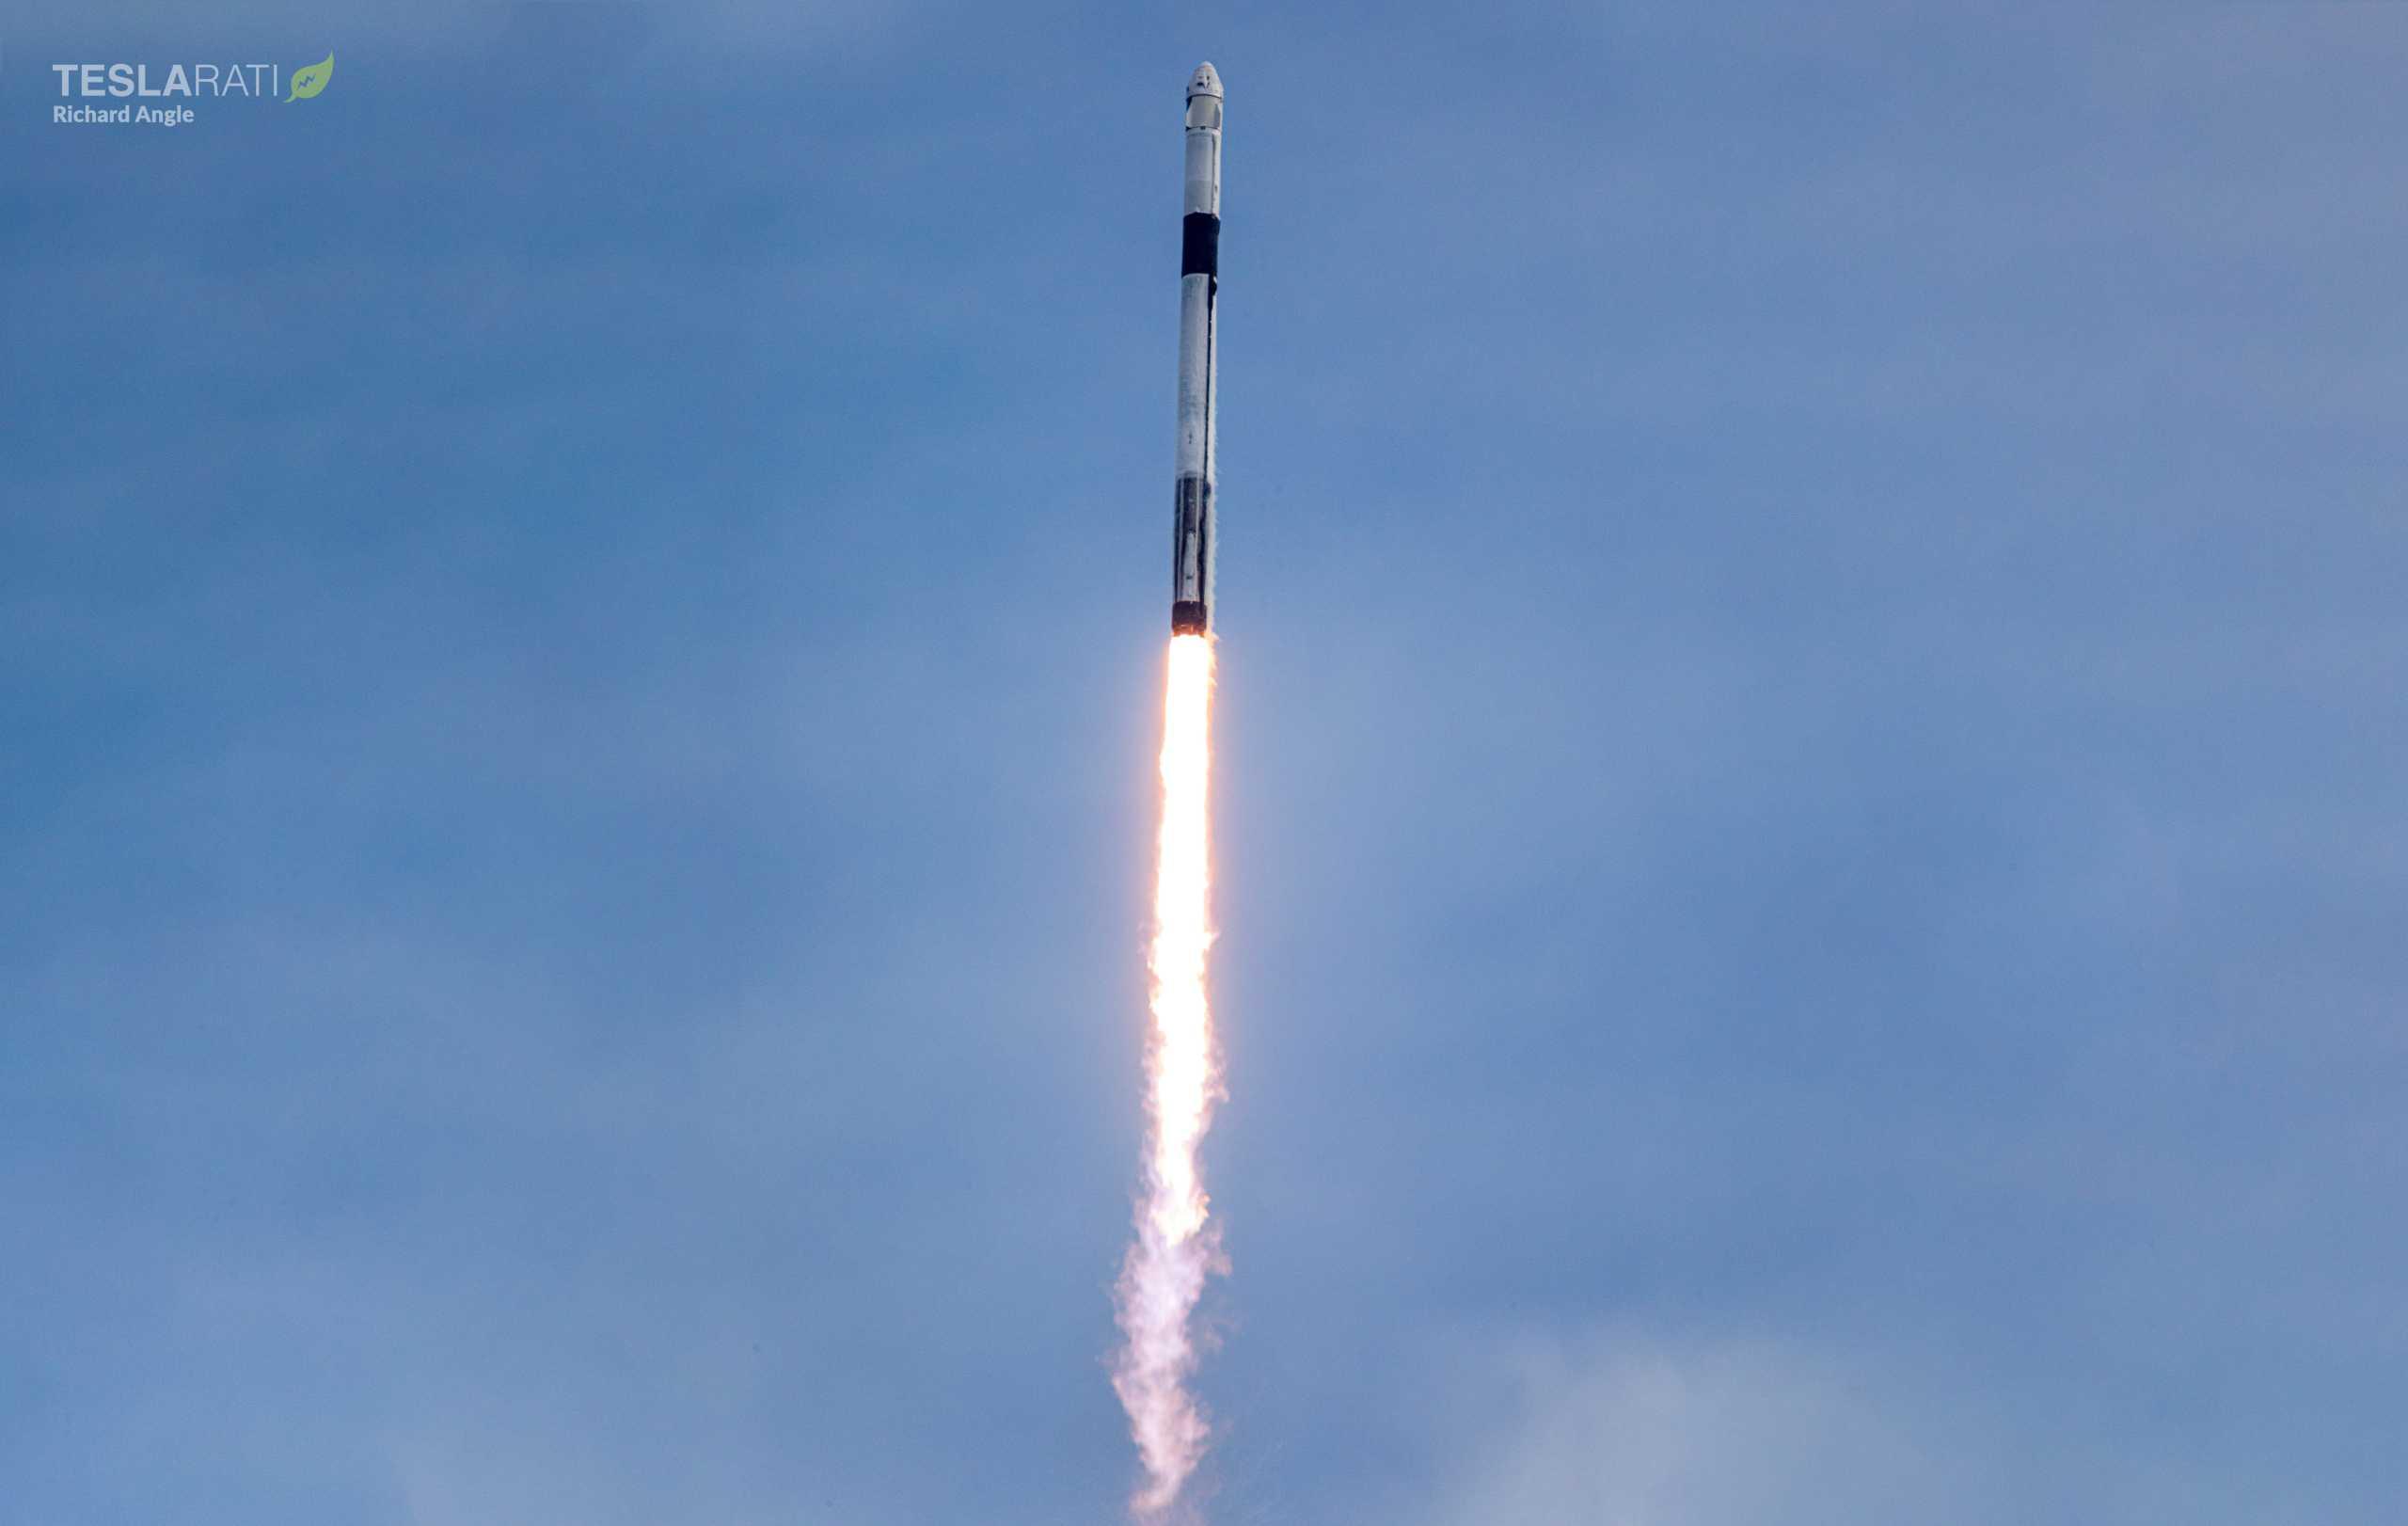 Crew Dragon C205 F9 B1046 IFA 39A launch 011920 (Richard Angle) (3) wide (c)